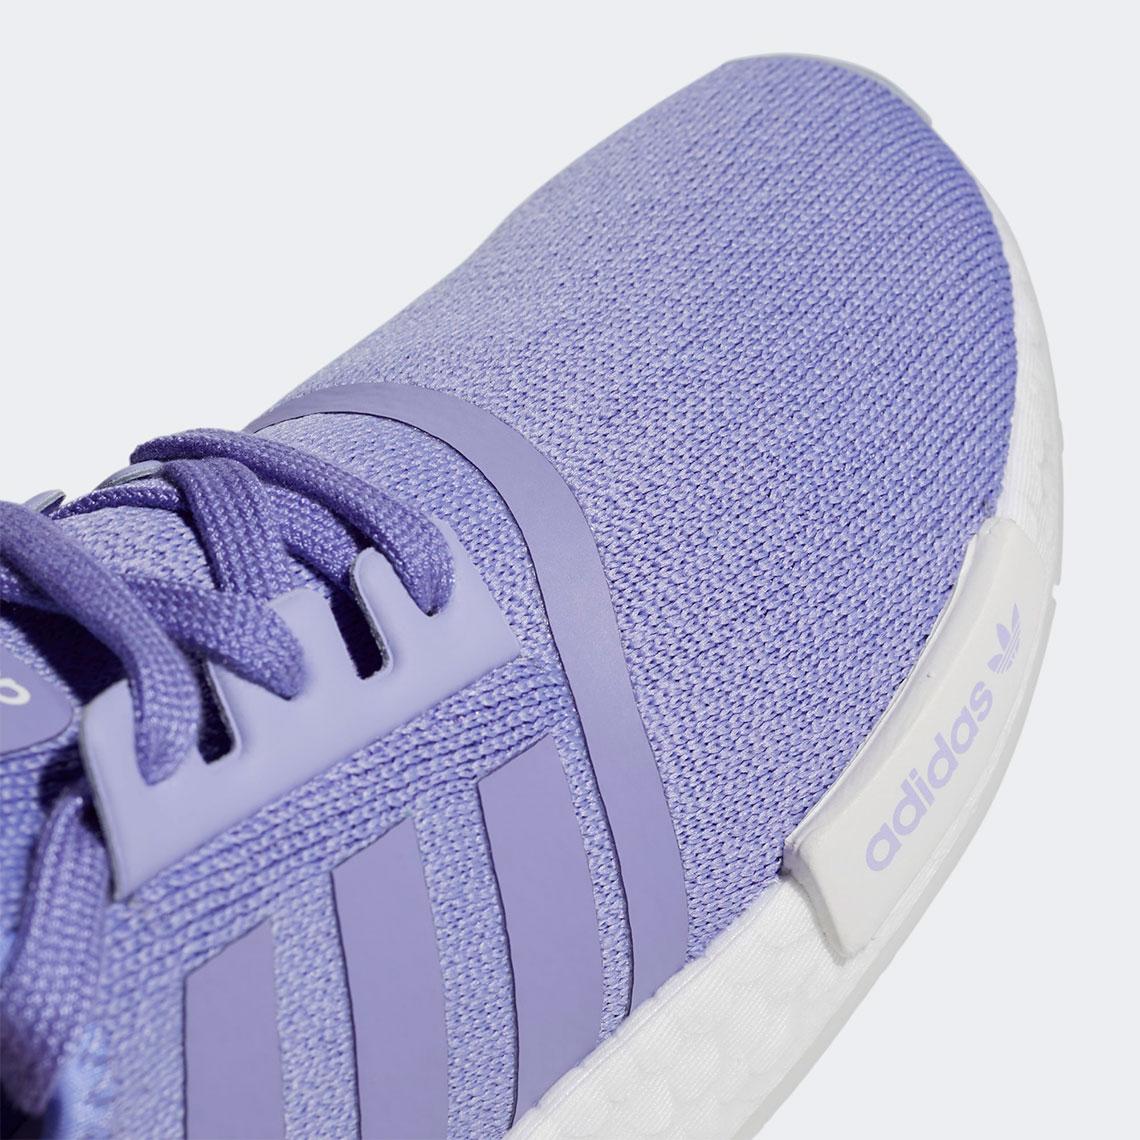 Wmns NMD_R1 'White Dust Purple'